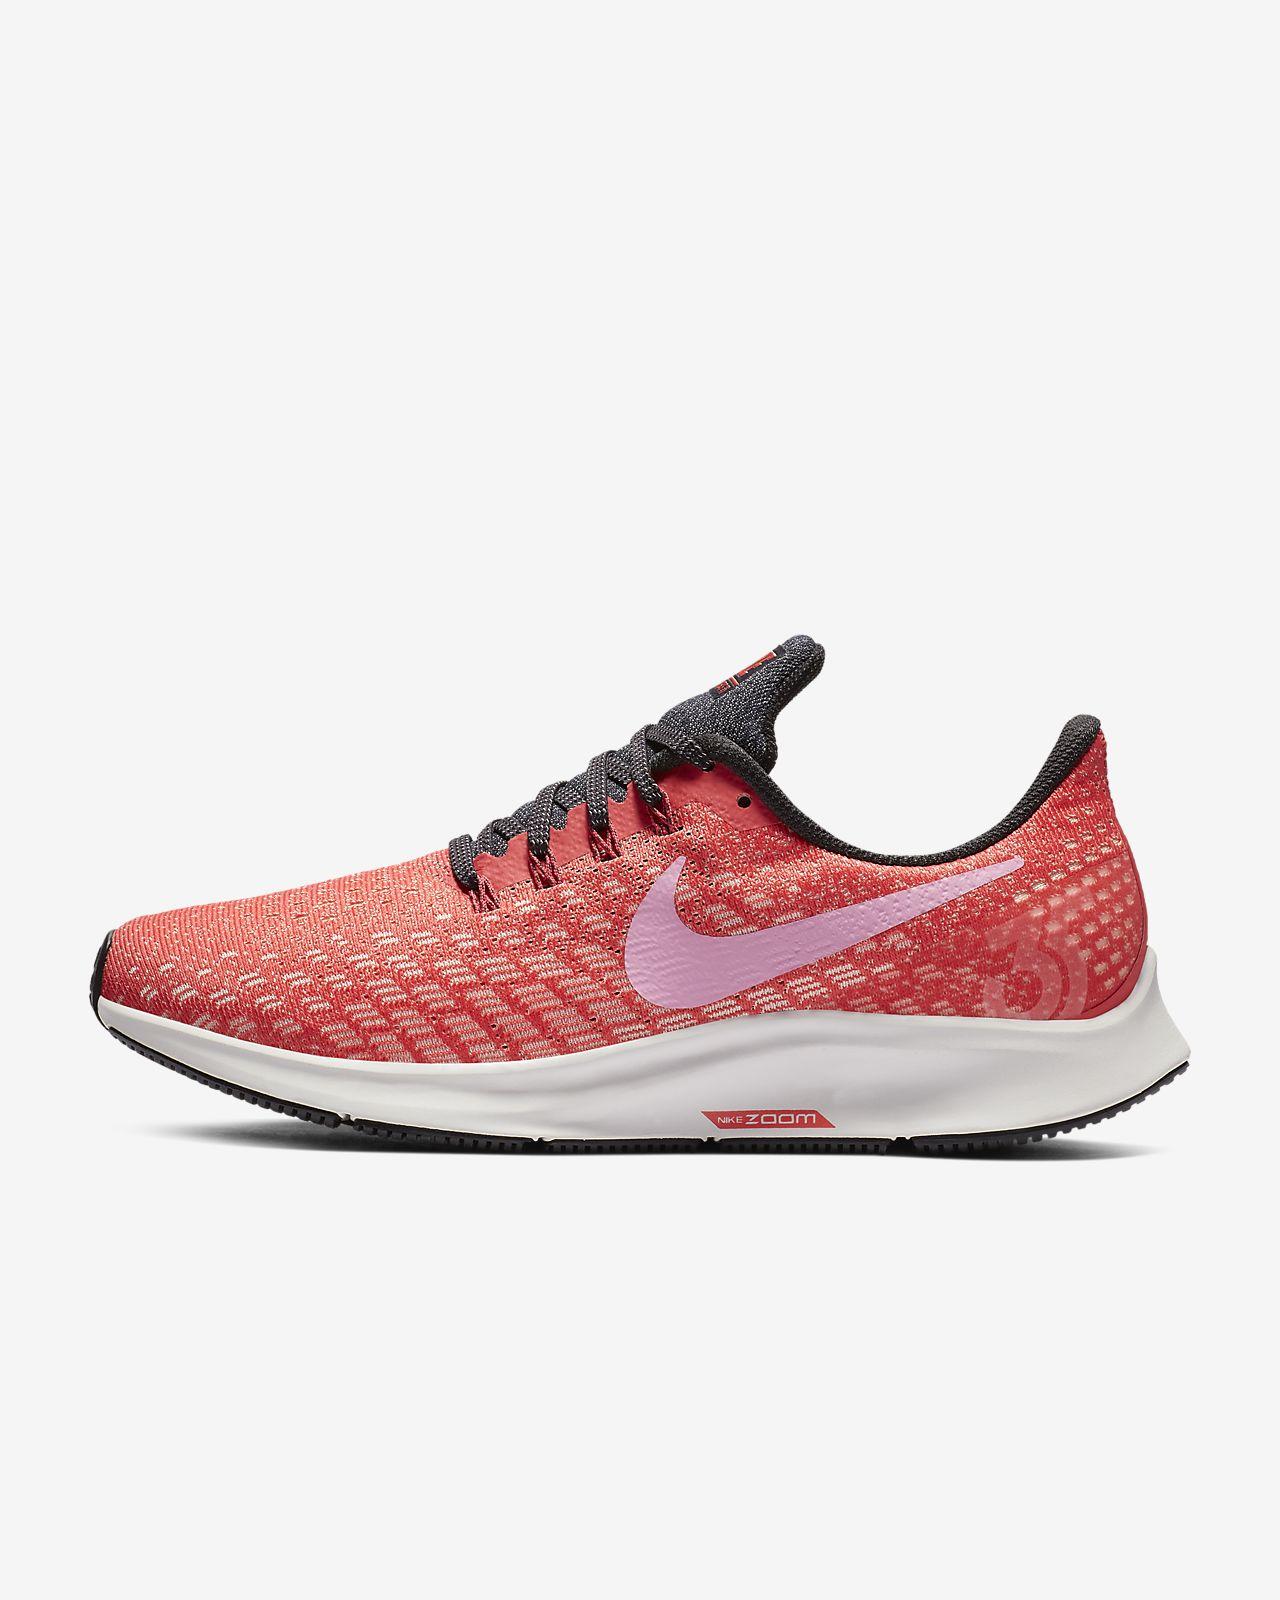 brand new 1c950 98505 ... Löparsko Nike Air Zoom Pegasus 35 för kvinnor